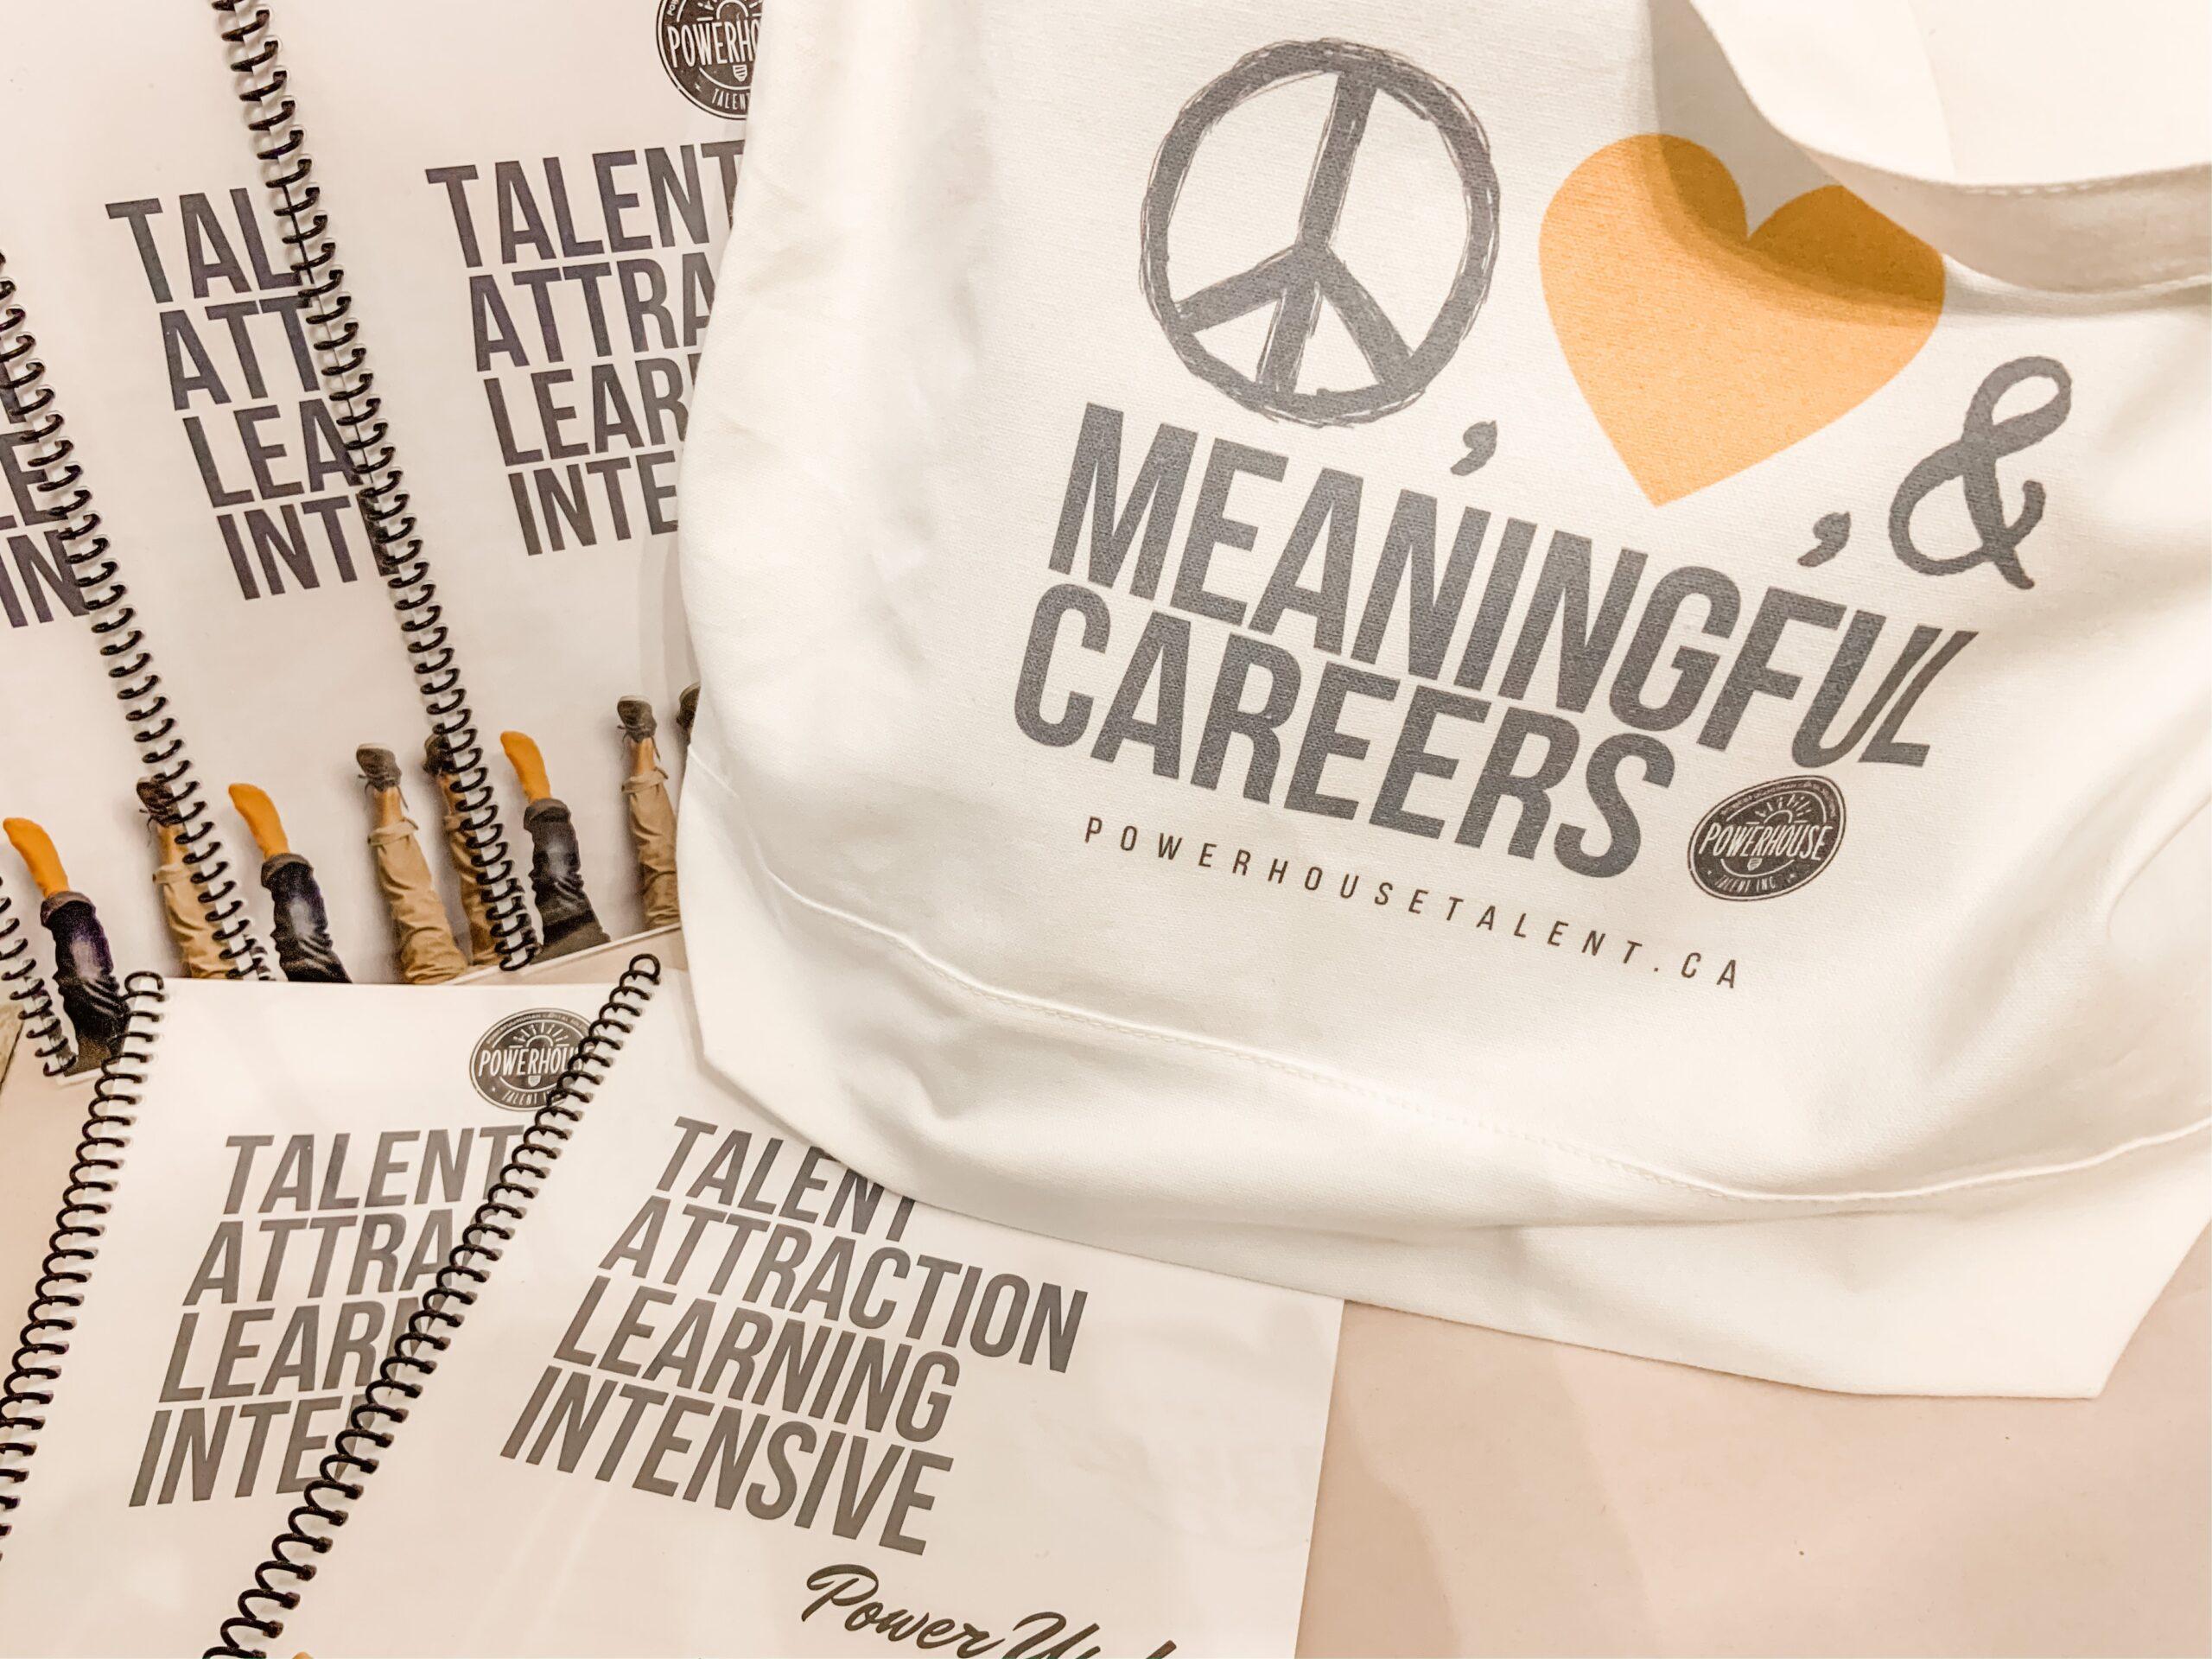 Powerhouse Talent's Employer Branding and Employee Engagement Training